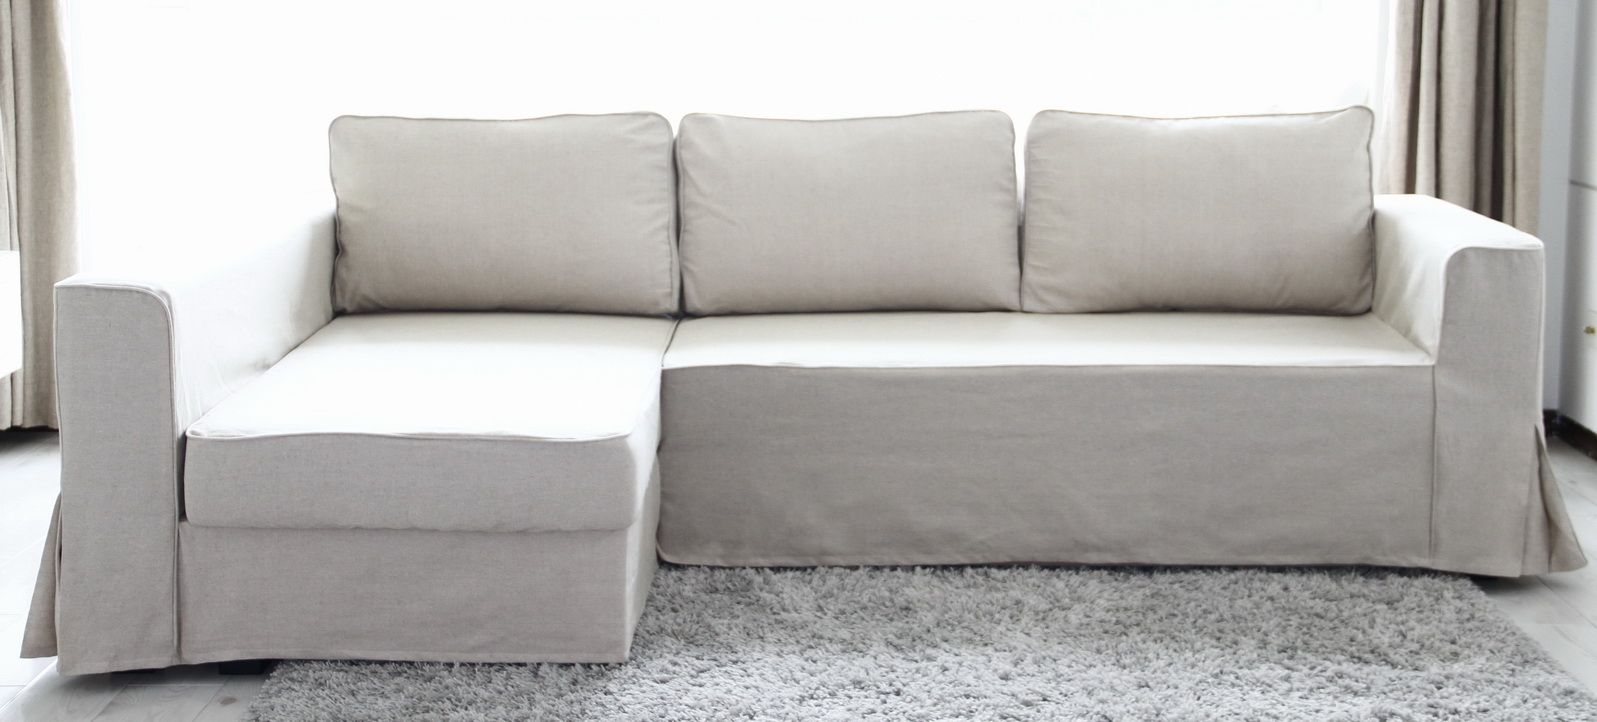 10 Custom Sofa Slip Covers Most